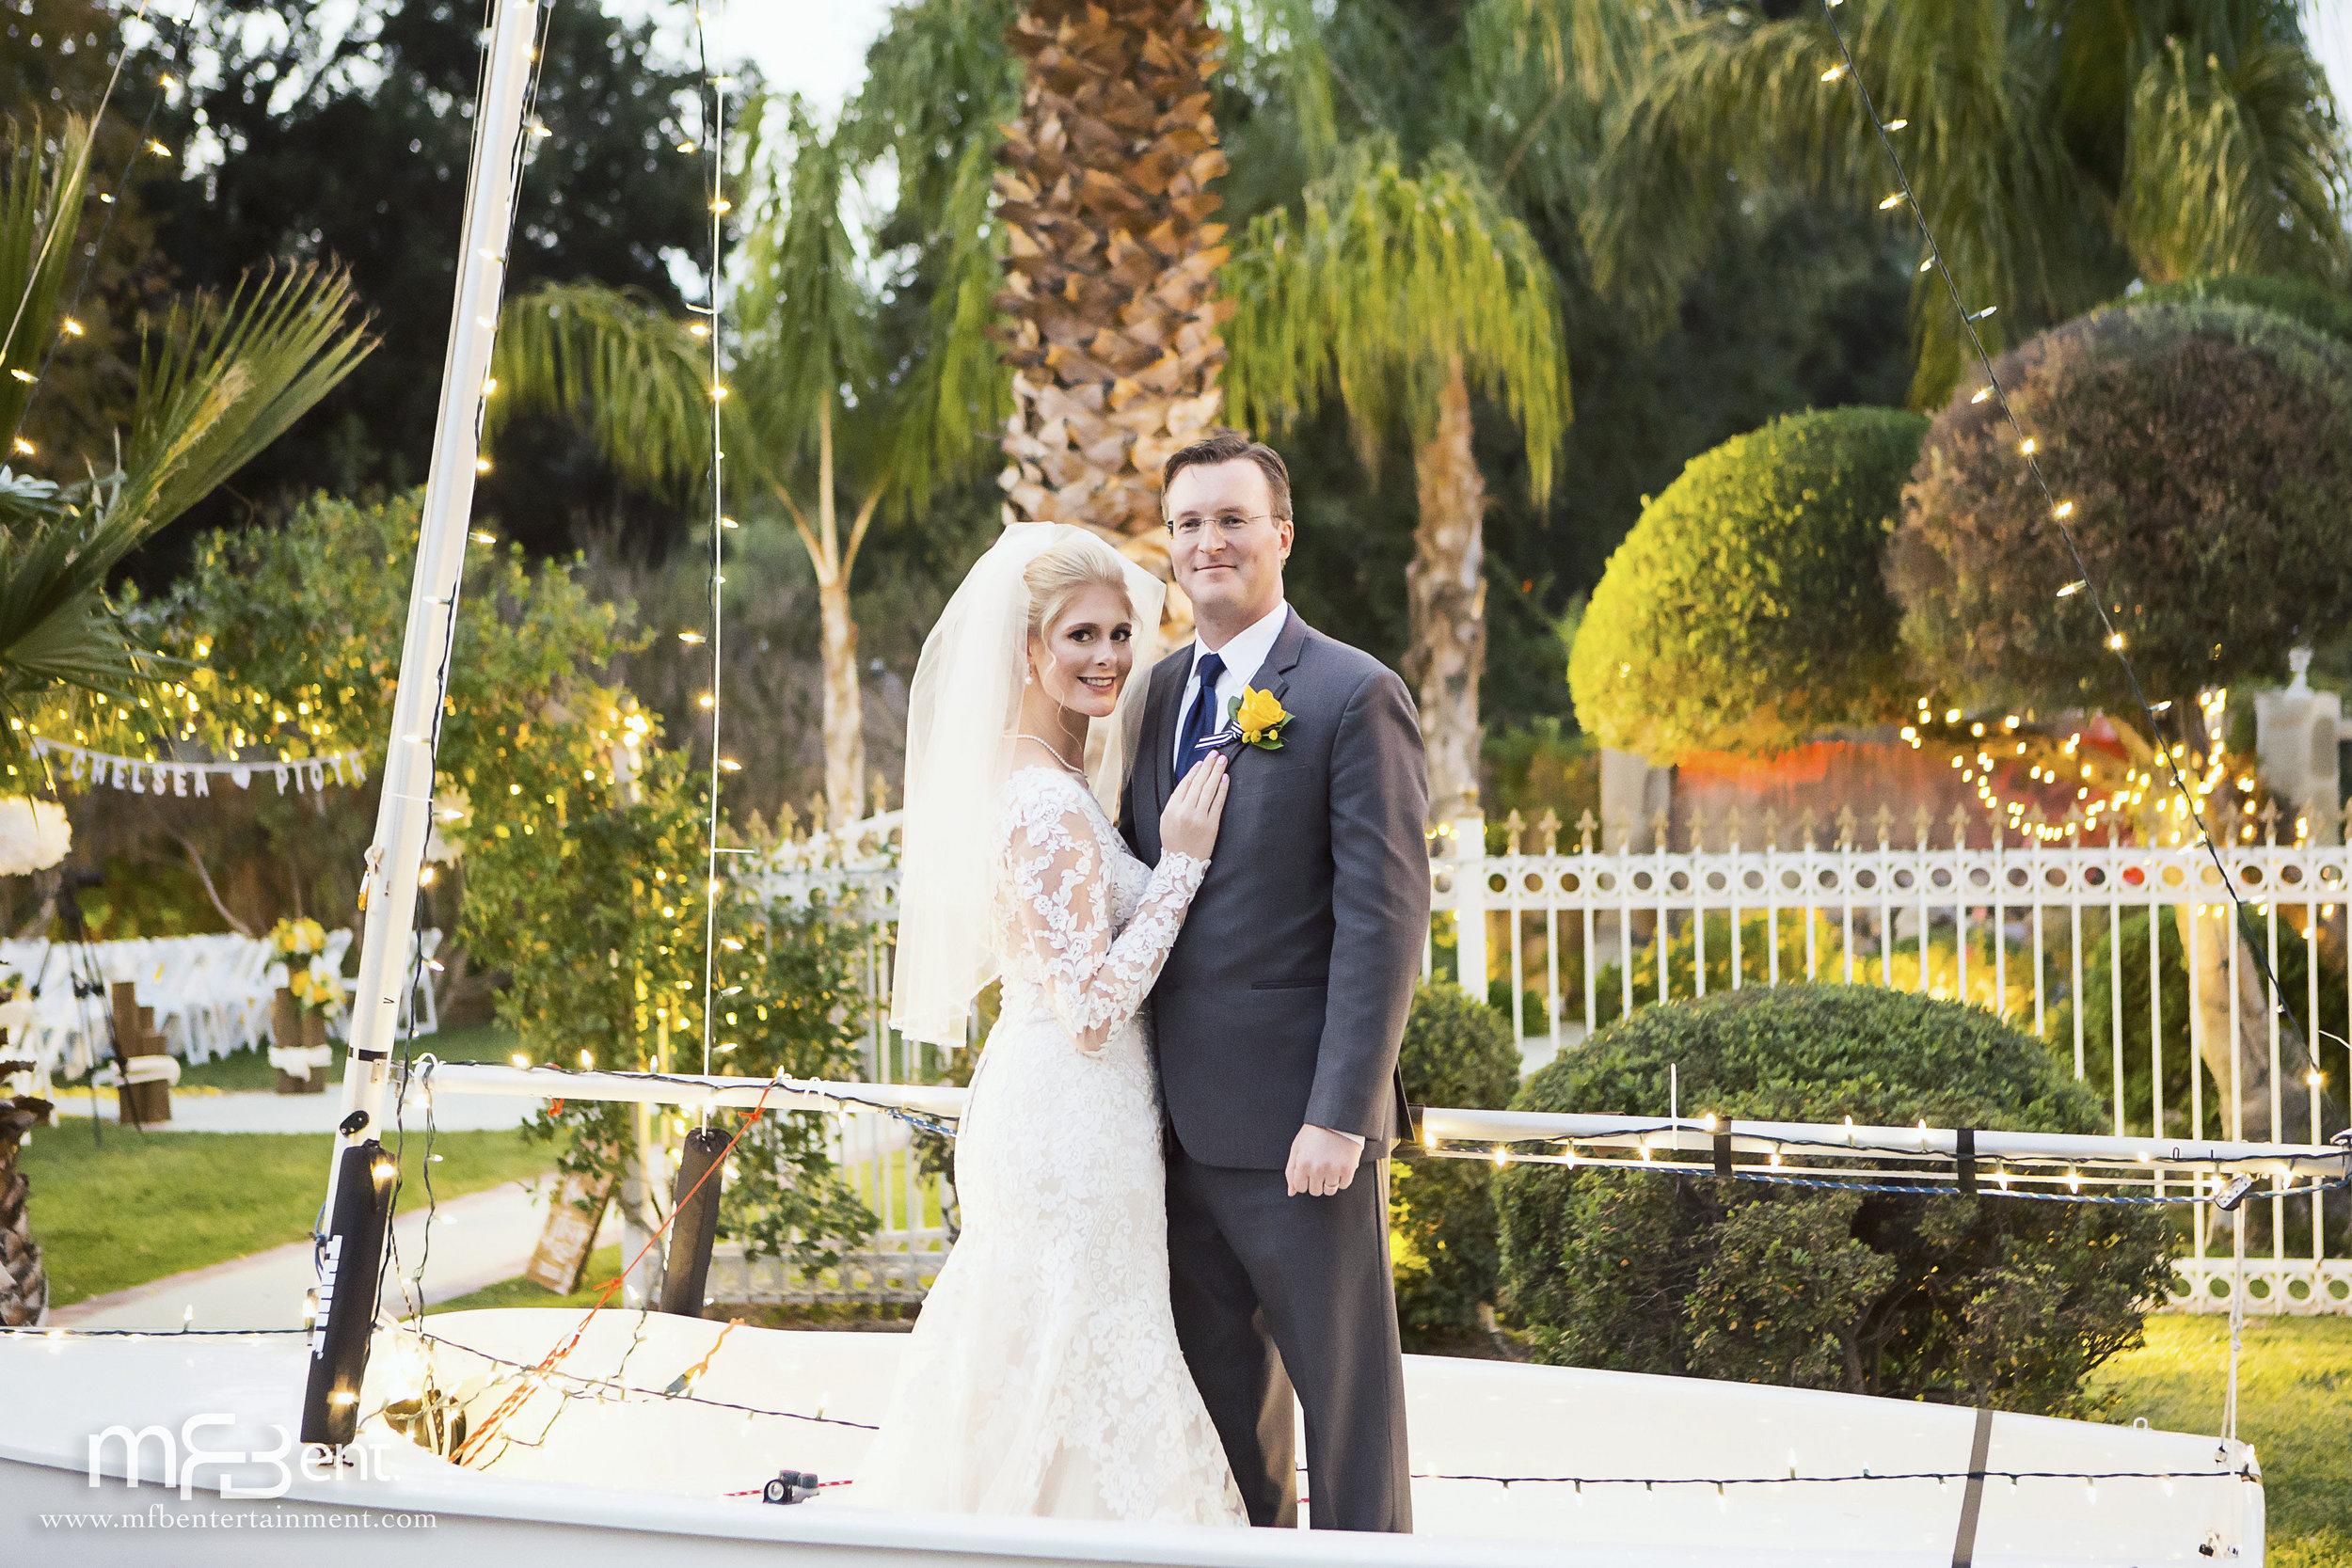 PIOTR CHELSEA WEDDING-PHOTO SESSION-0055 L.jpg